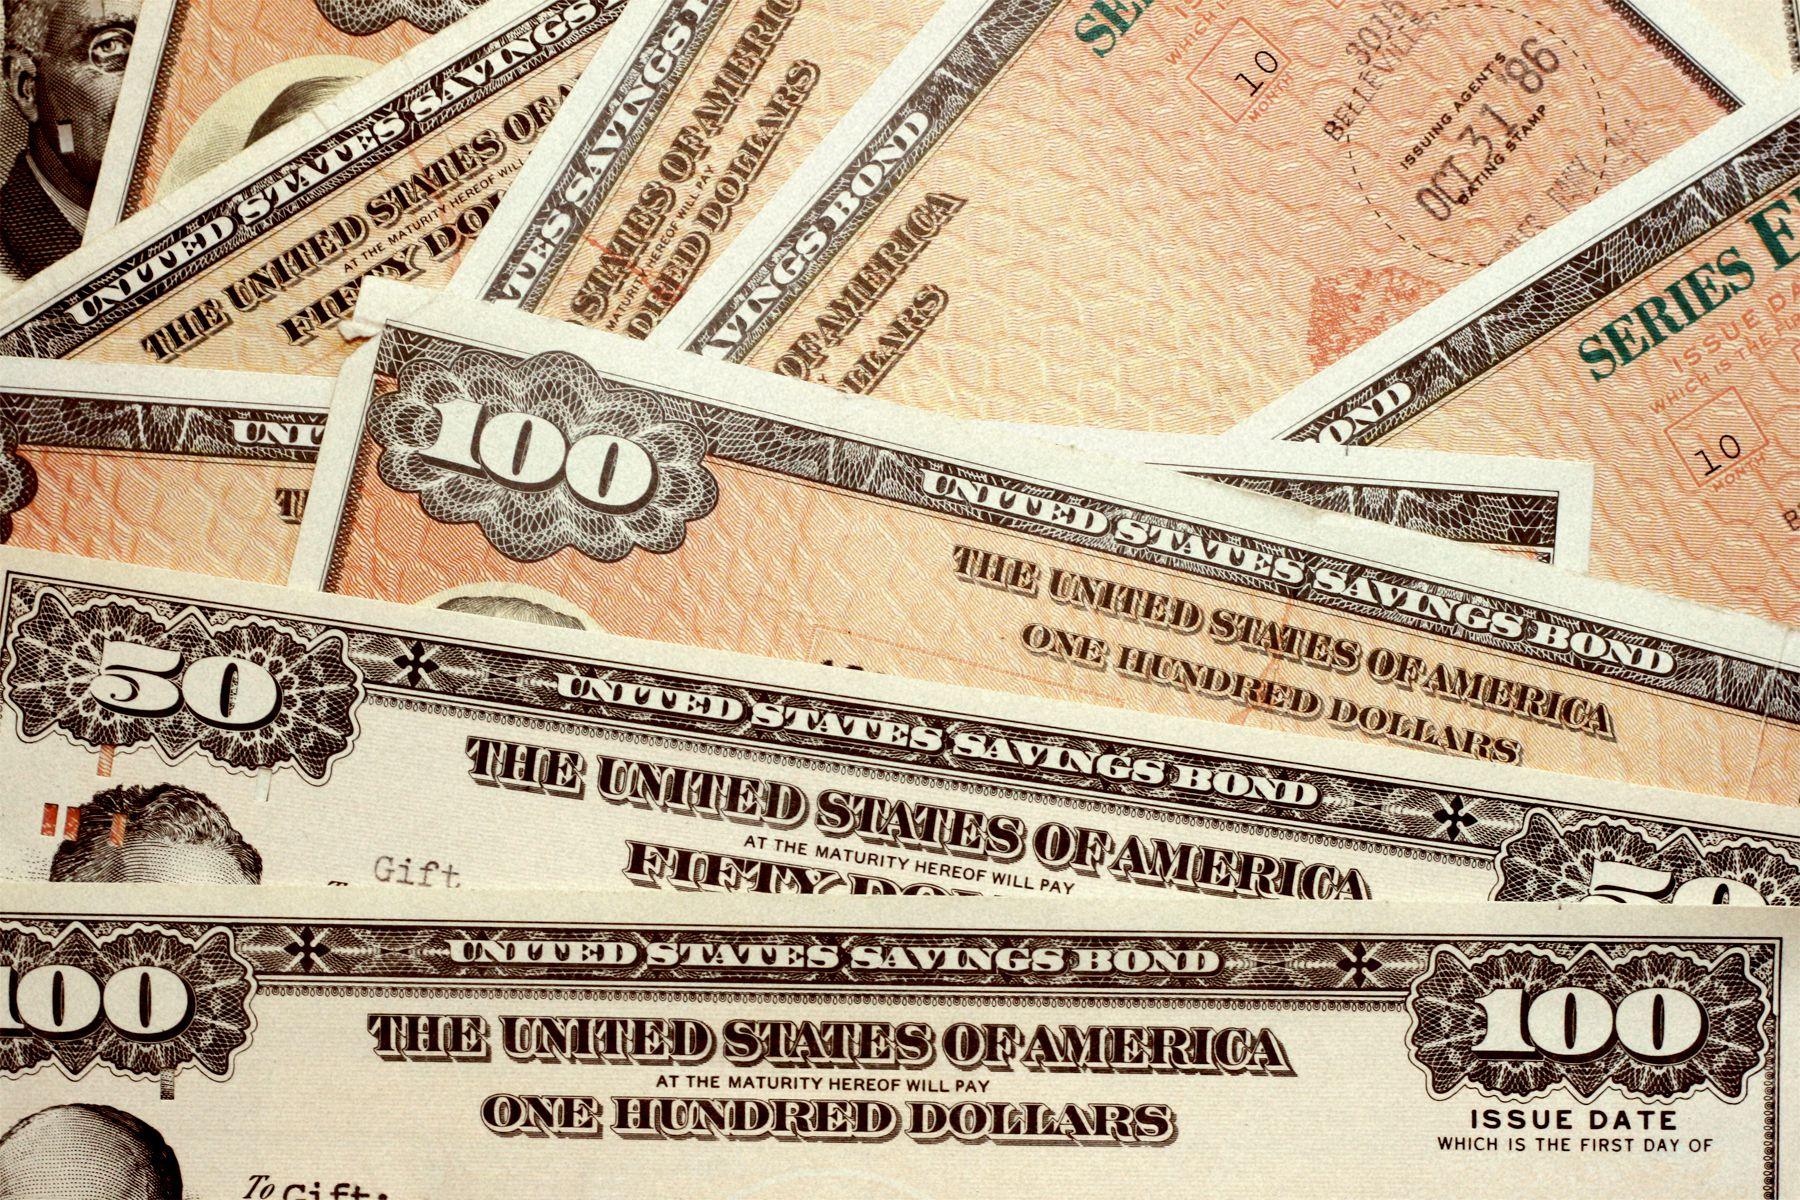 Selling Bank Bonds Before Maturity